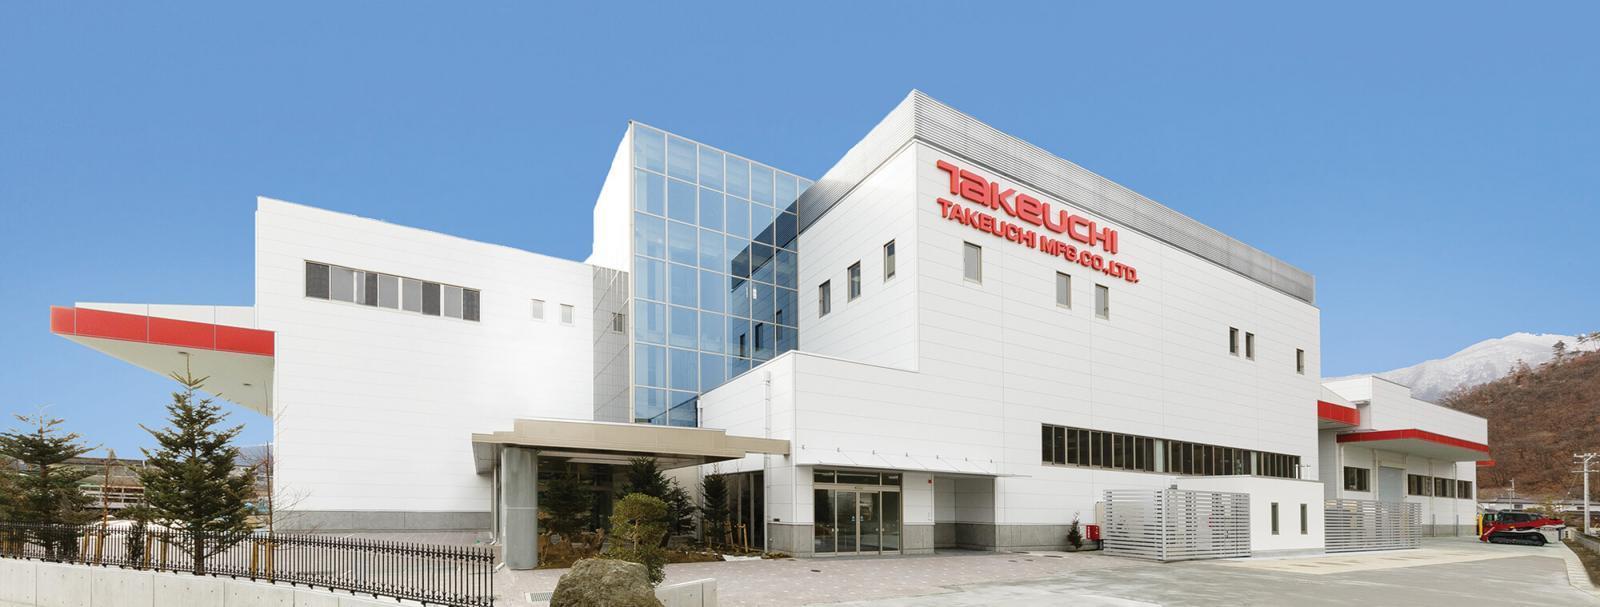 Takeuchi expands Japanese headquarters